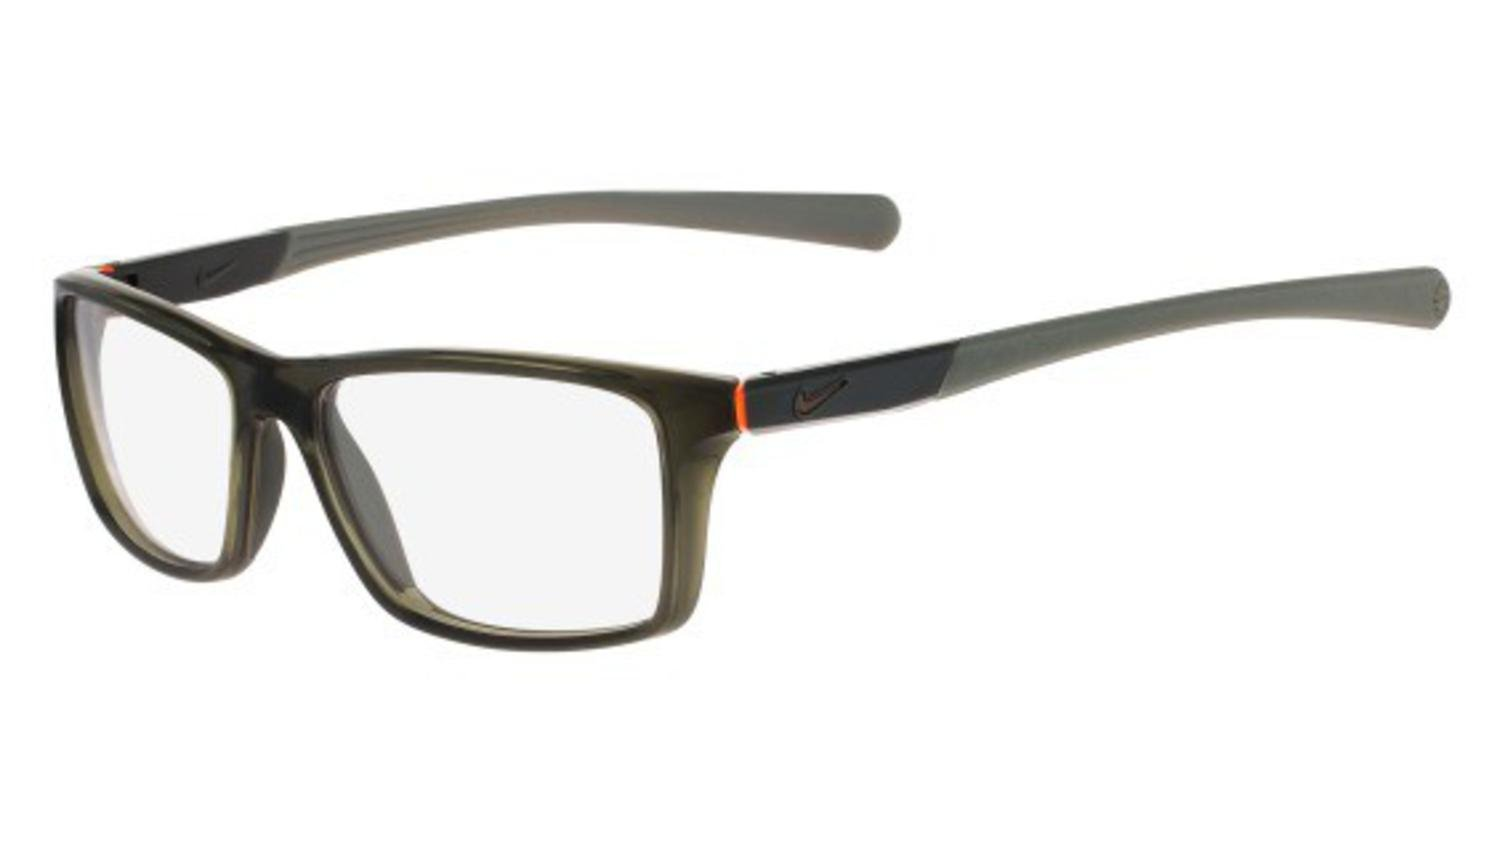 Eyeglasses NIKE 7087 083 CARGO KHAKI-TOTAL ORANGE